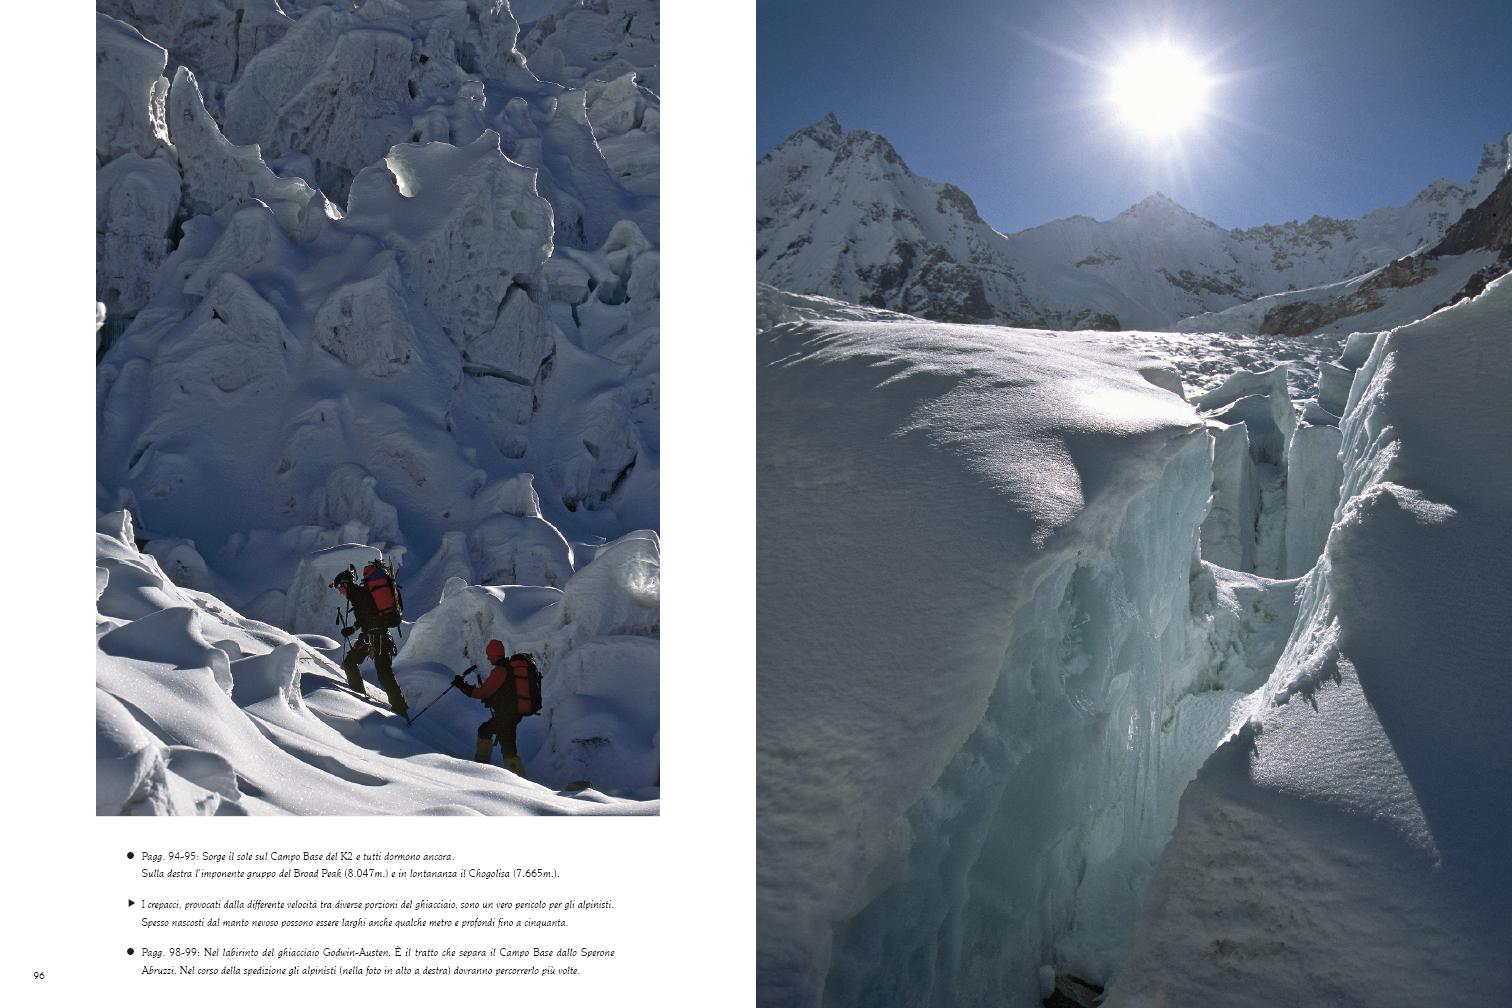 K2 EXPEDITION 1954-2004 Giuseppe Ghedina Fotografo - 050.jpg